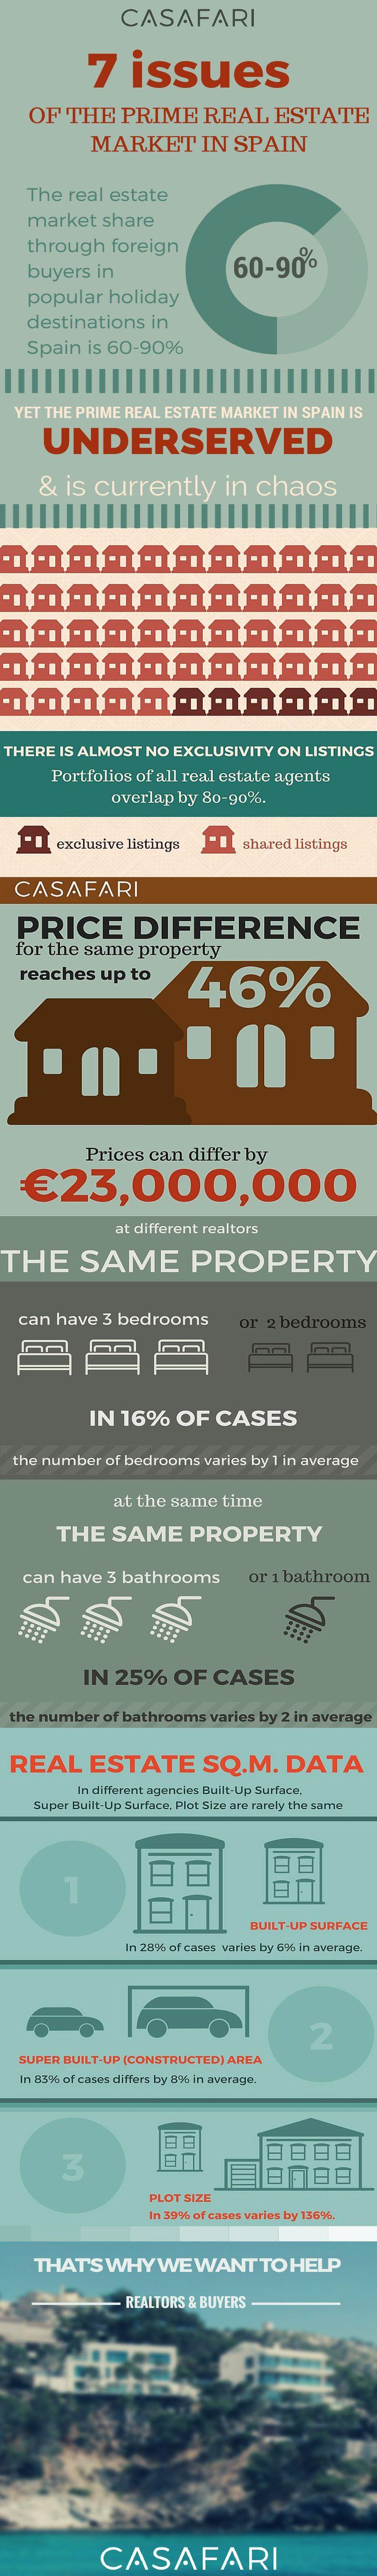 [infographic] #casafari #noexclusivity #brokerage #estateagent #realestate #luxury #prime #properties #property #spain #villa #house #finca #apartment #penthouse #estate #mallorca #majorca #ibiza #barcelona